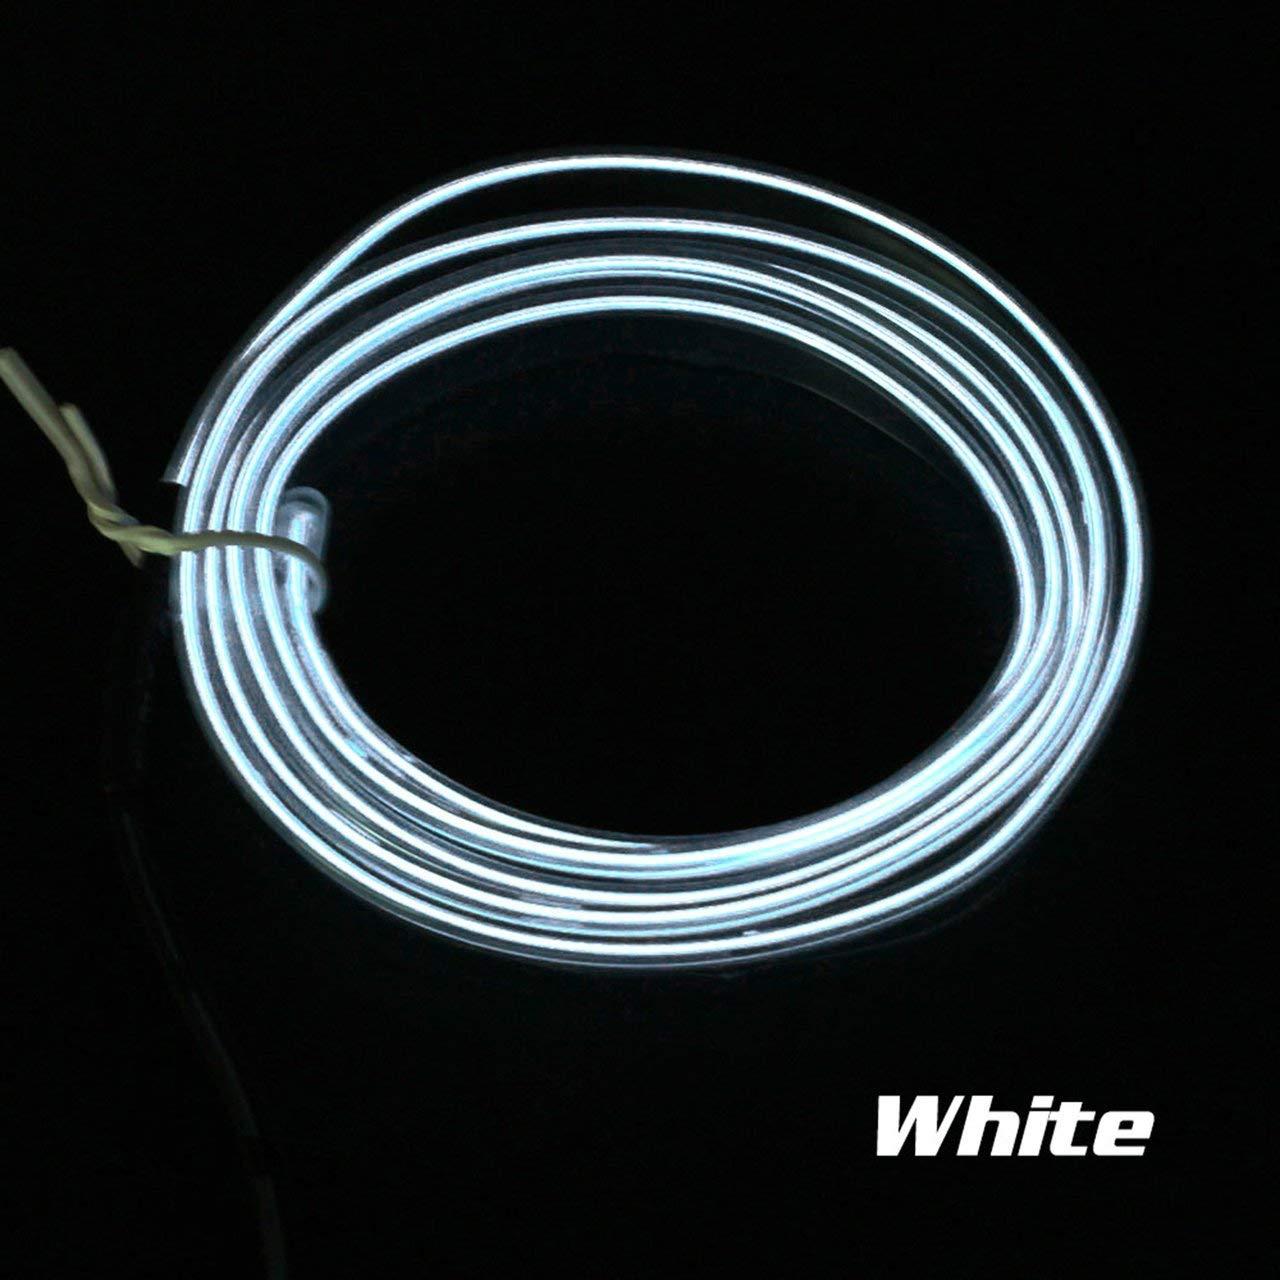 3 V rot jasnyfall LED EL Licht Neon Seil Auto Dance Glow Licht Streifen 12 V Controller USB Stick Auto Dekoration Licht Auto Styling Party Decor